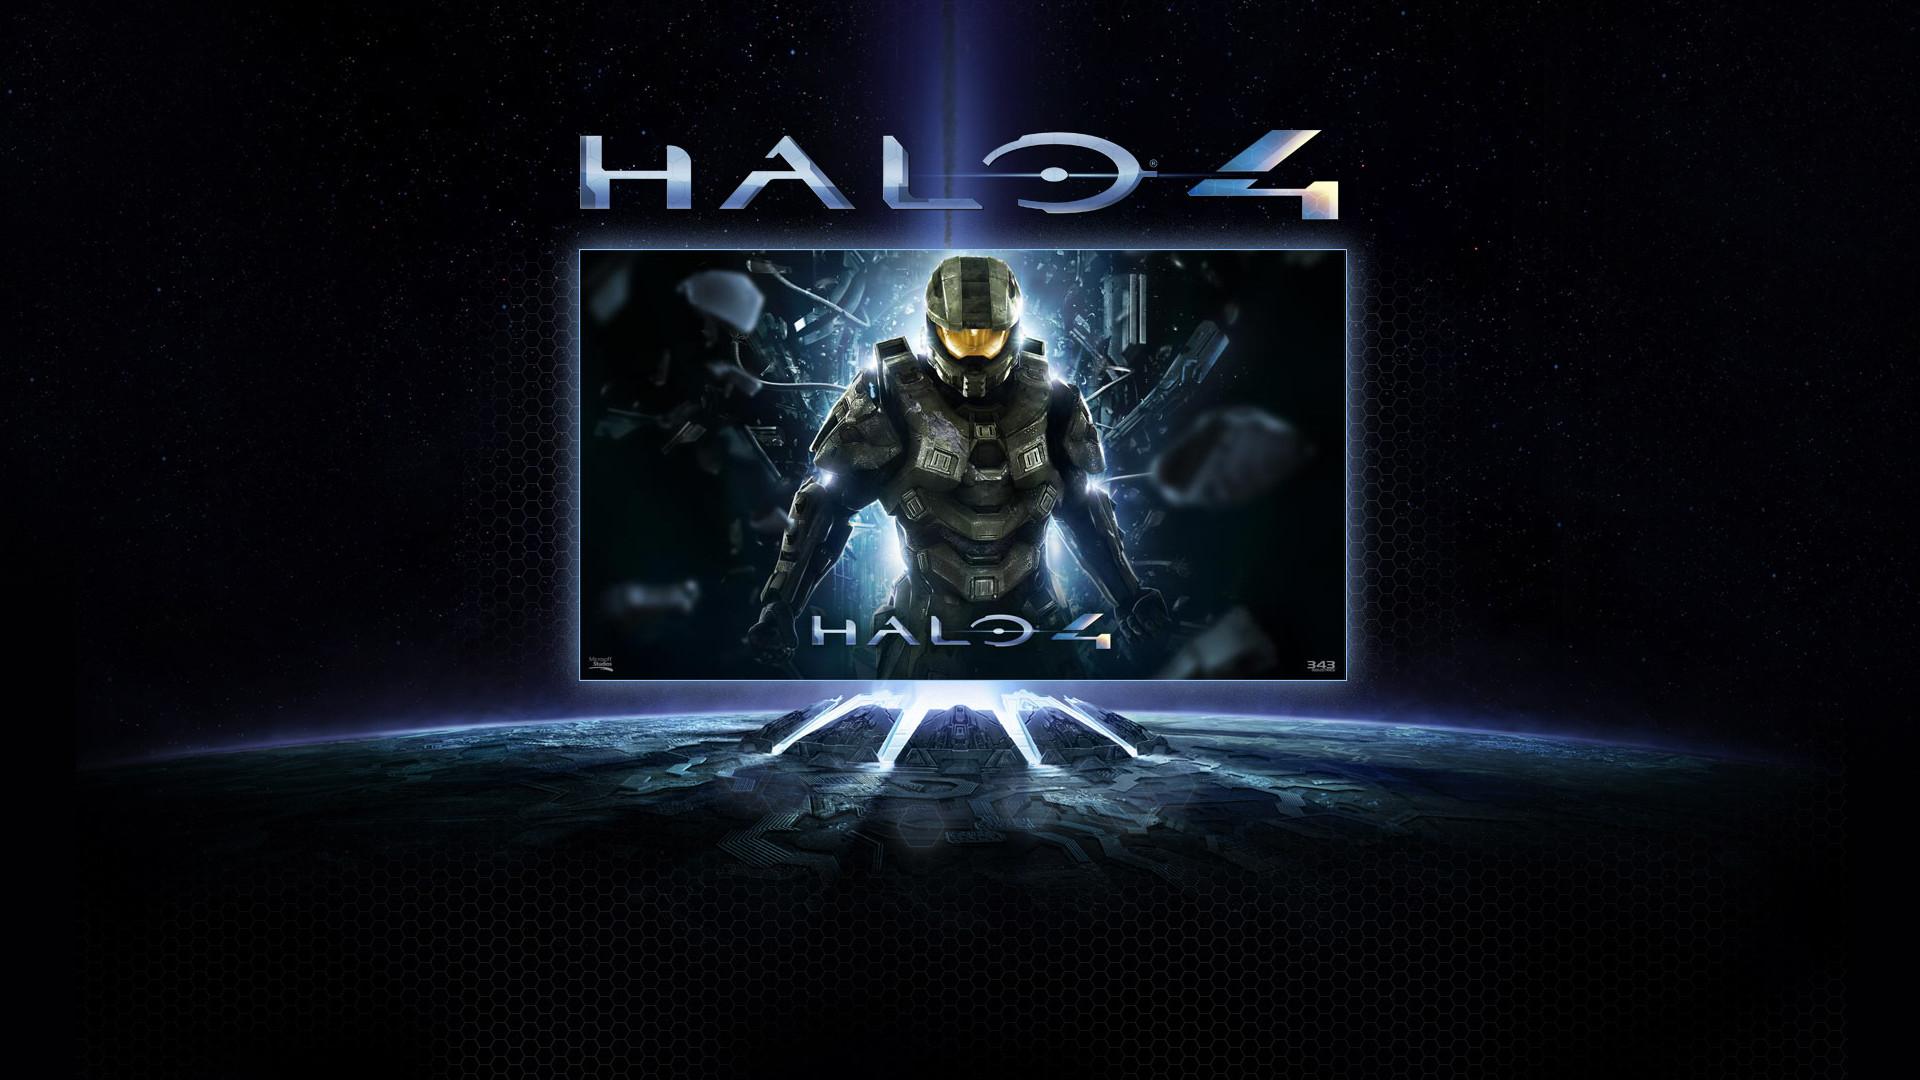 Halo 4 – Master Chief blue backdrop